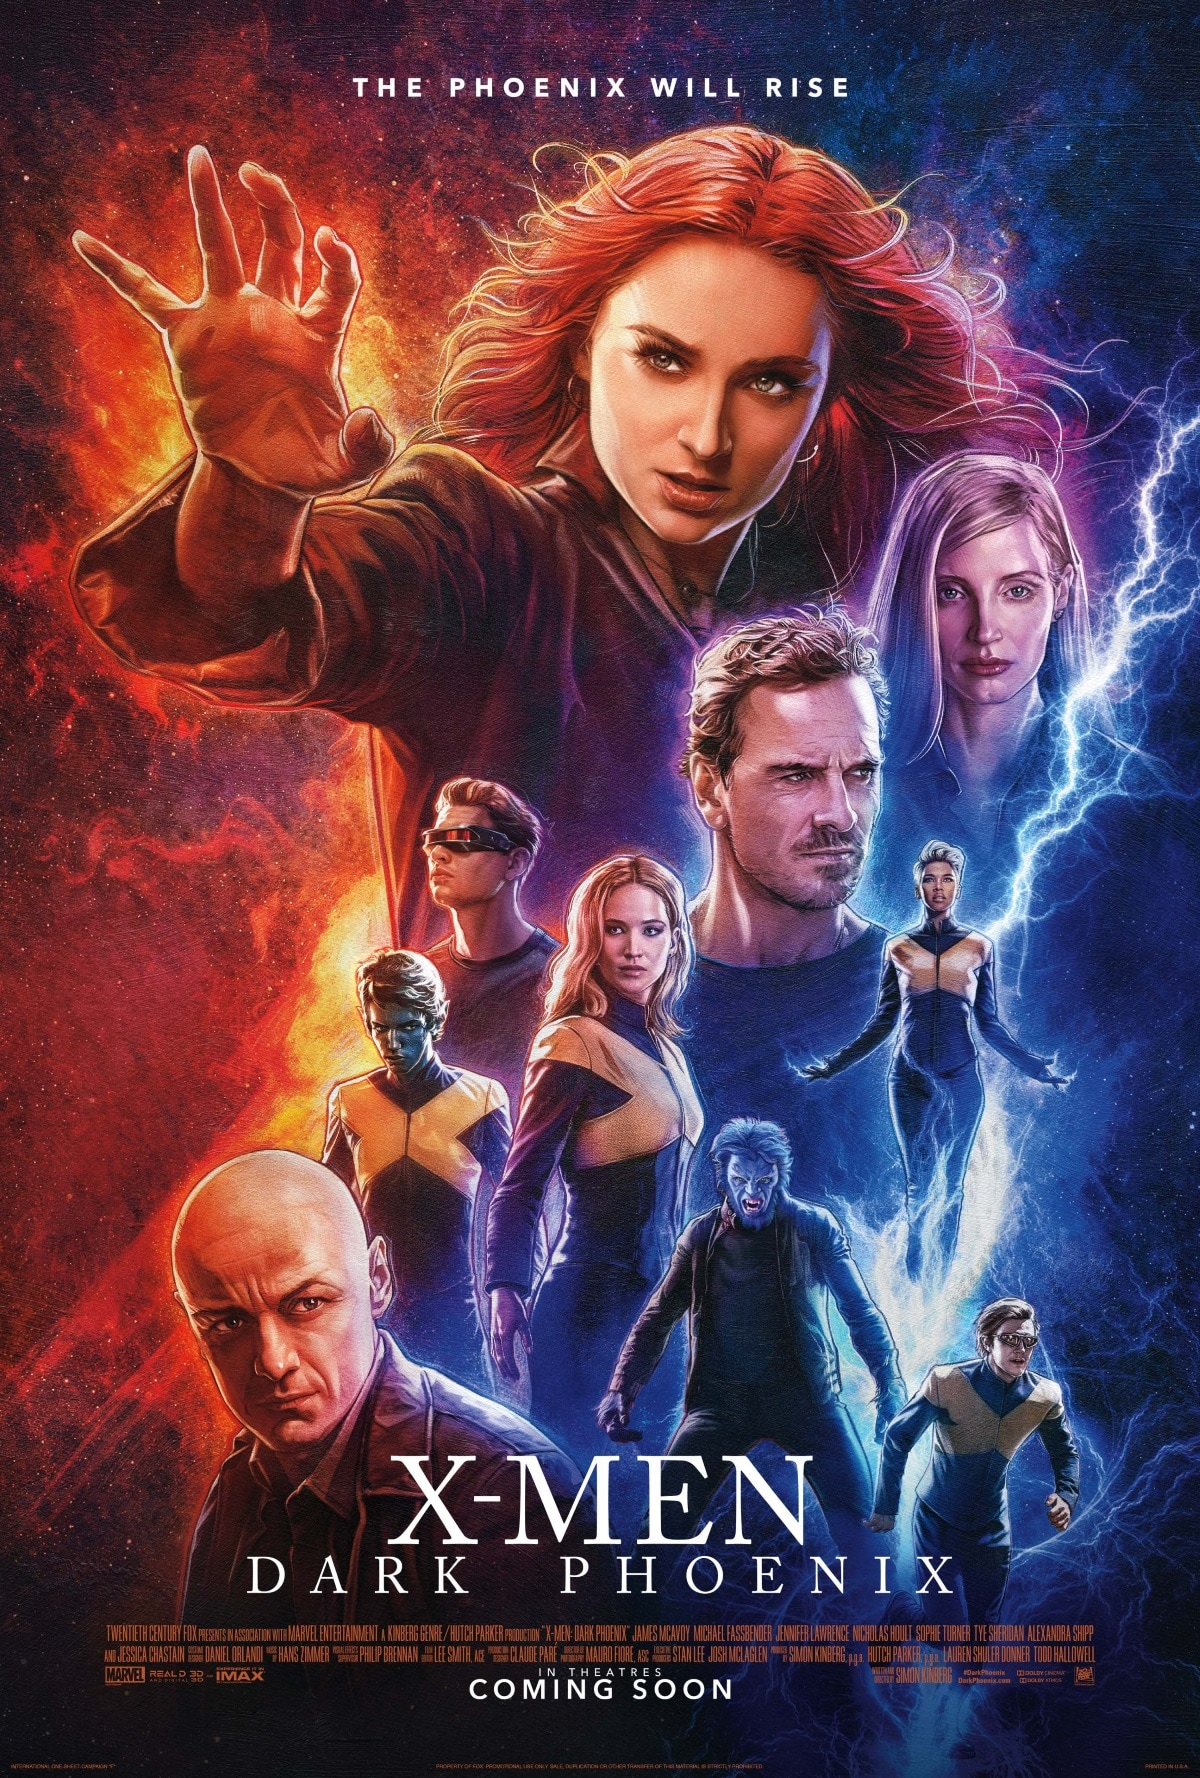 x men dark phoenix poster 2 X Men Dark Phoenix poster